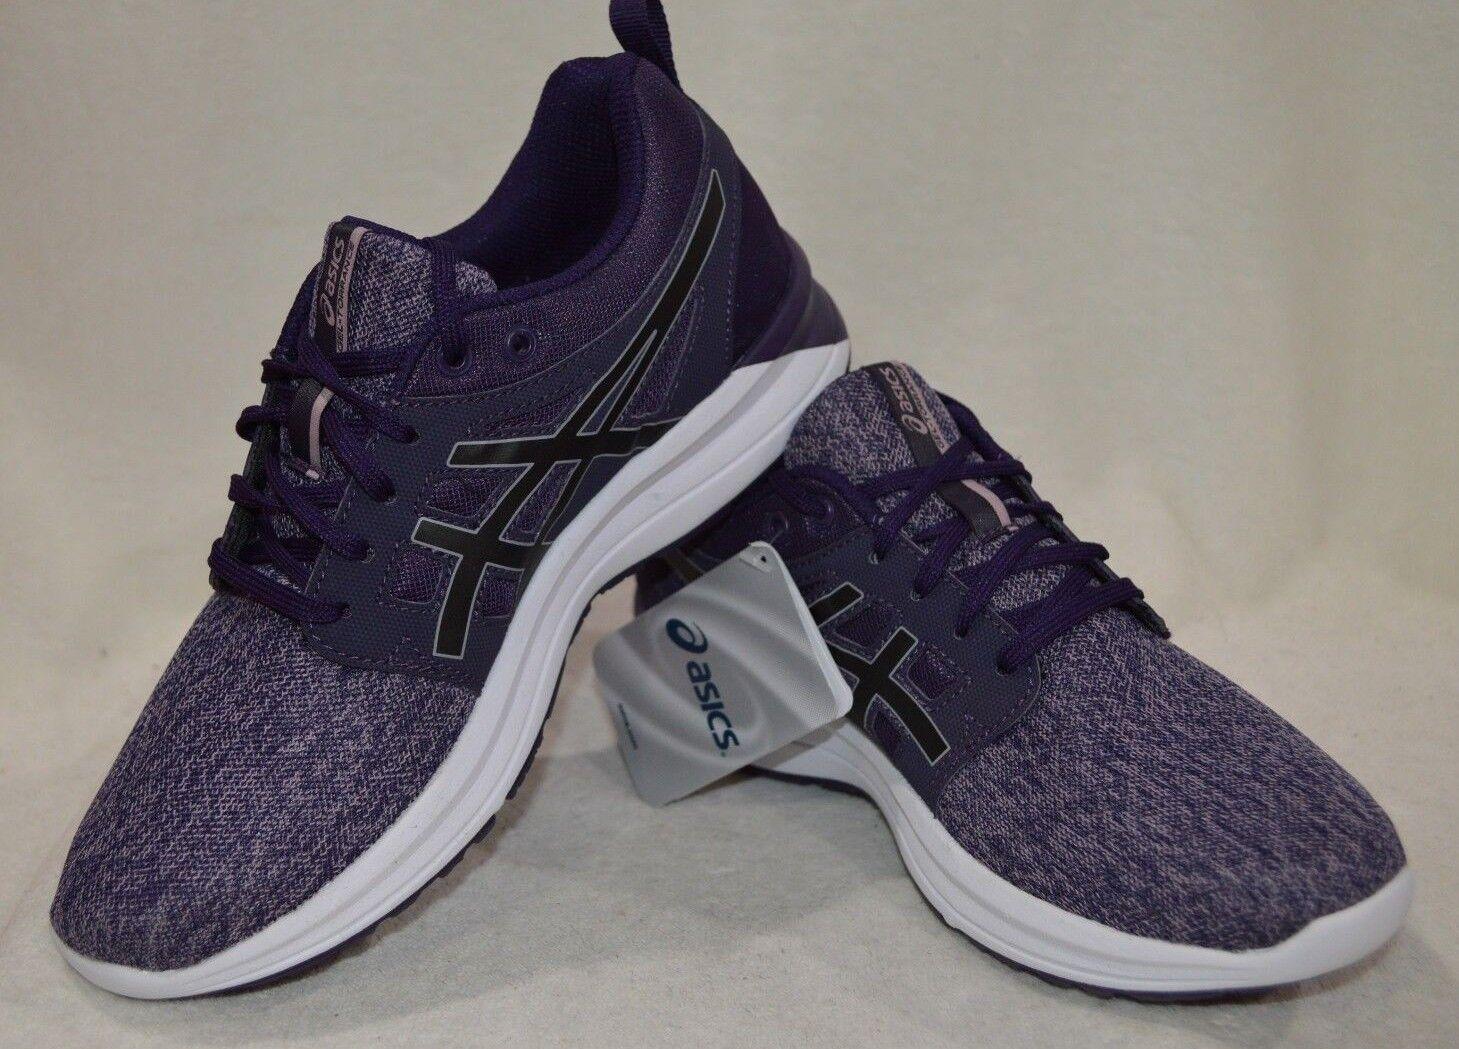 ASICS Mysterioso/Black/Aluminum Women's GEL-Torrance Mysterioso/Black/Aluminum ASICS Running Shoes-Size 7 NWOB ebbad8